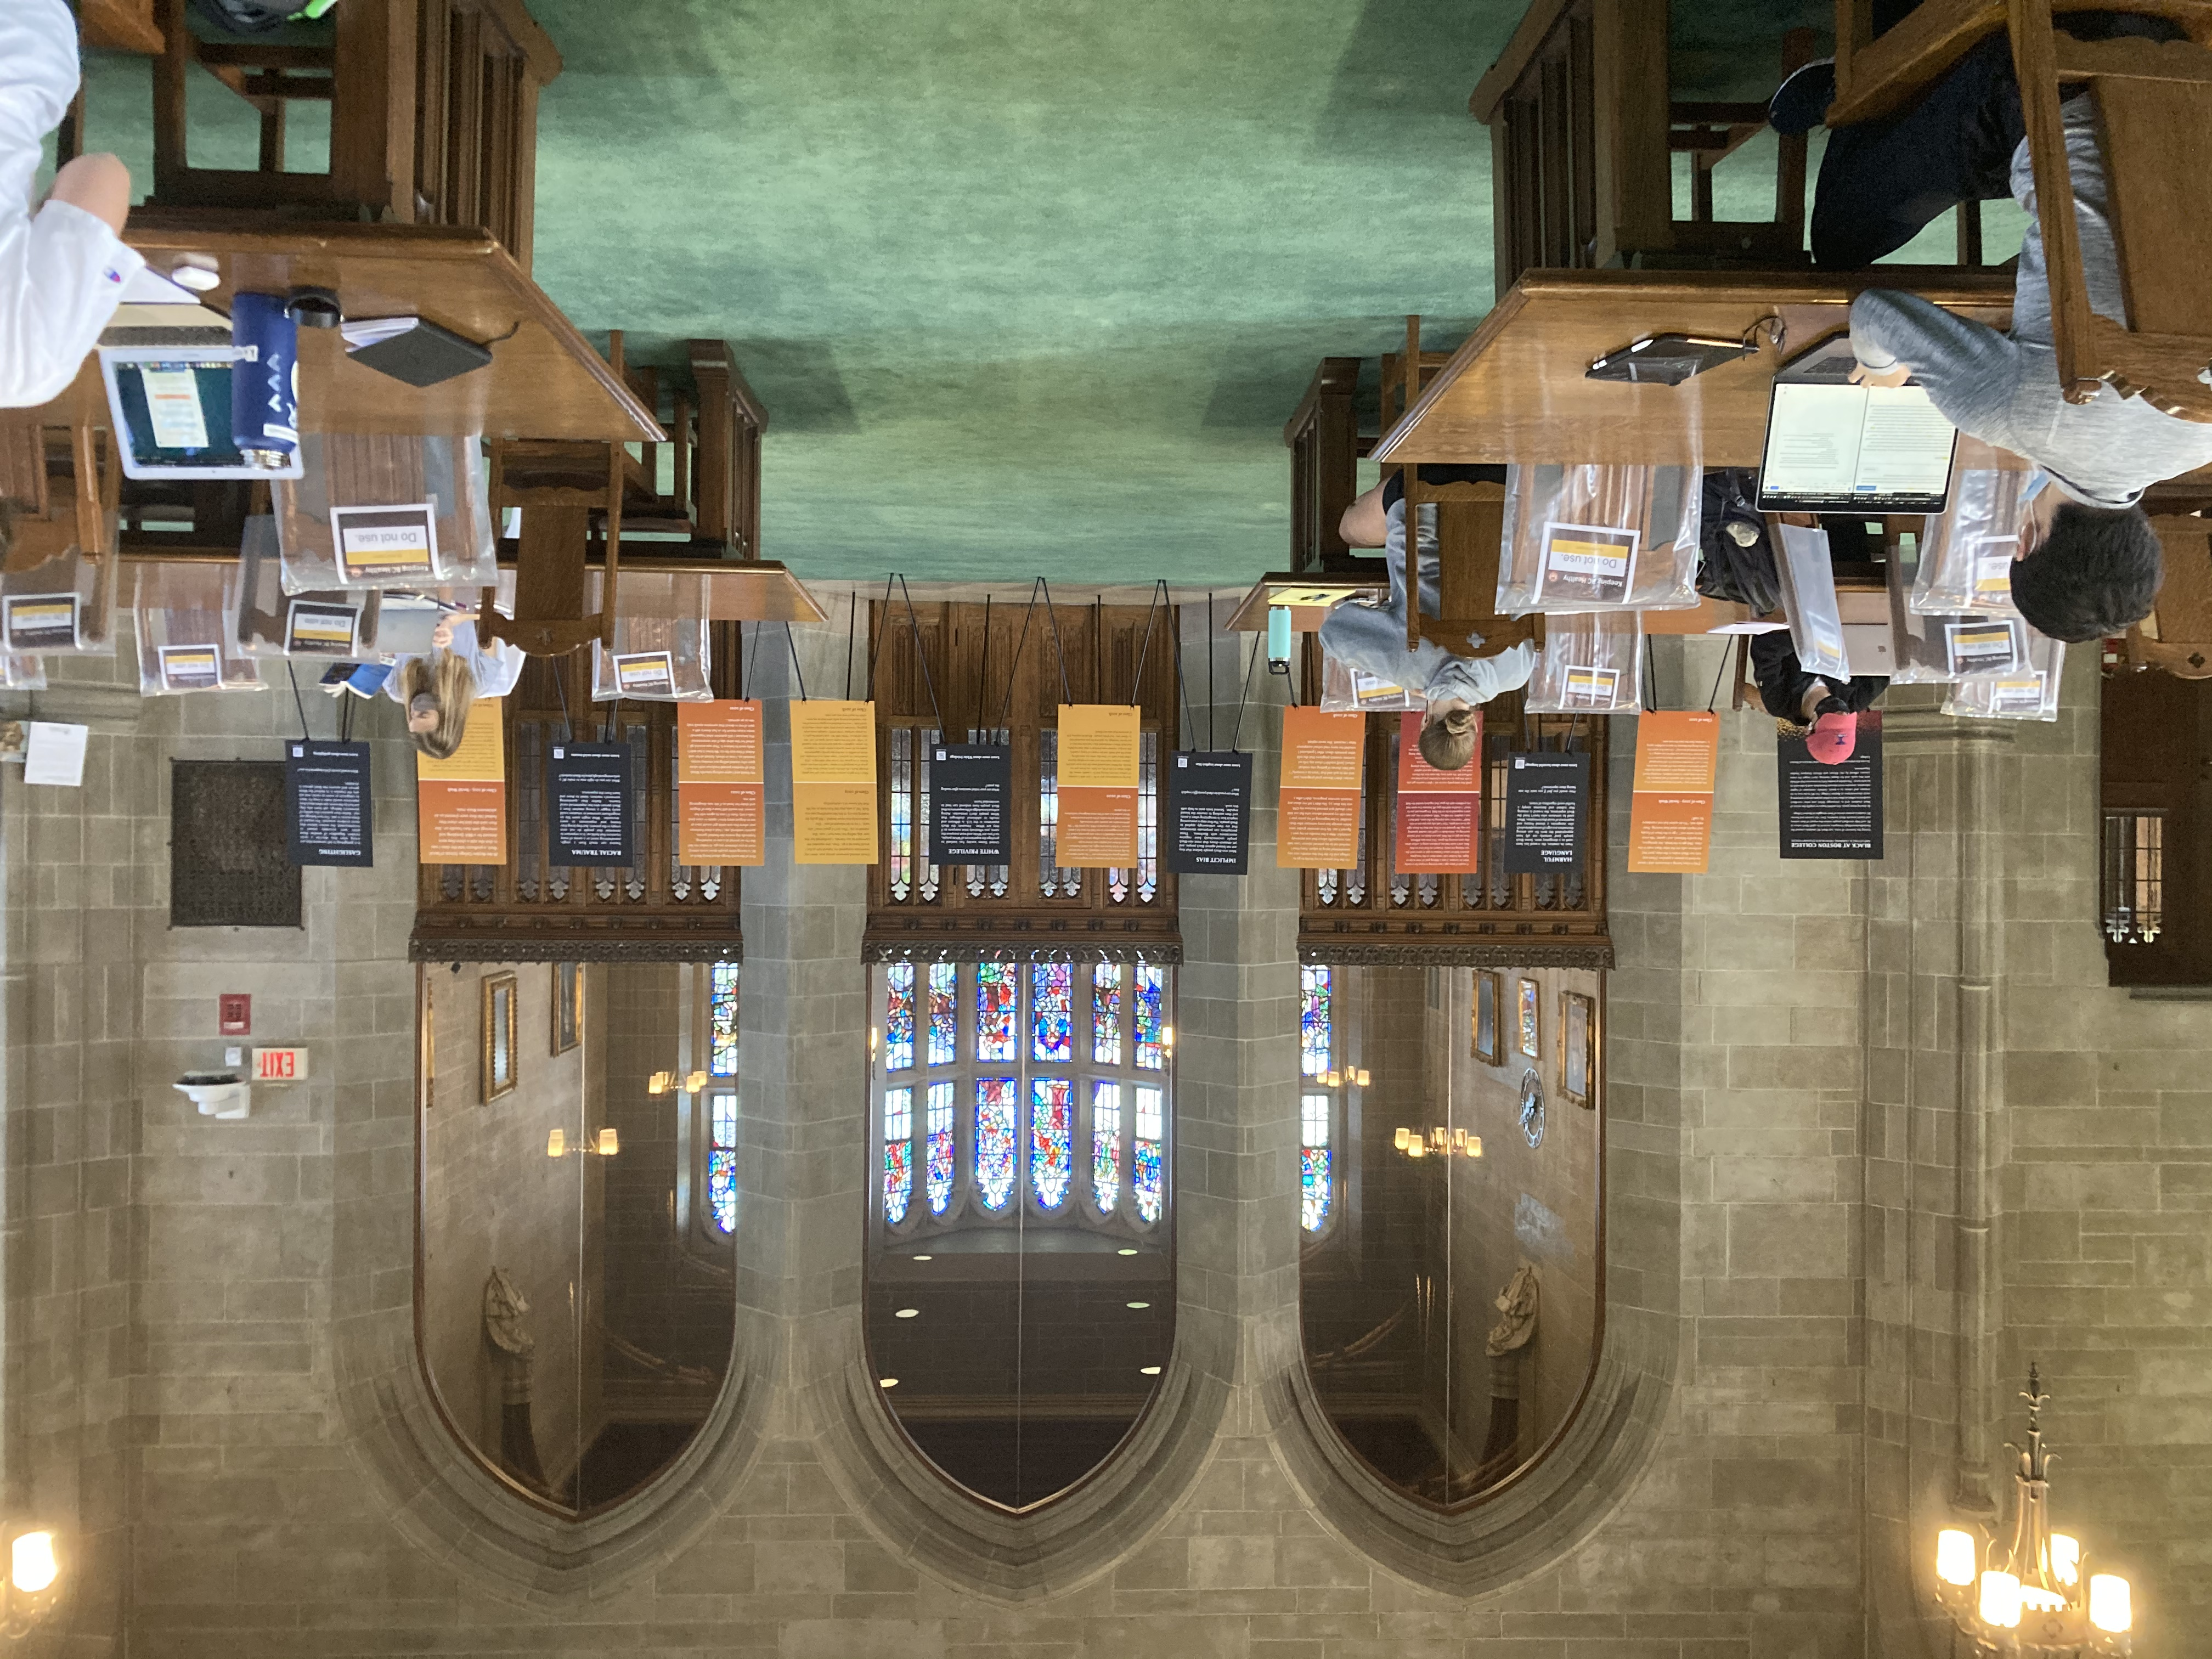 Bapst Library installation